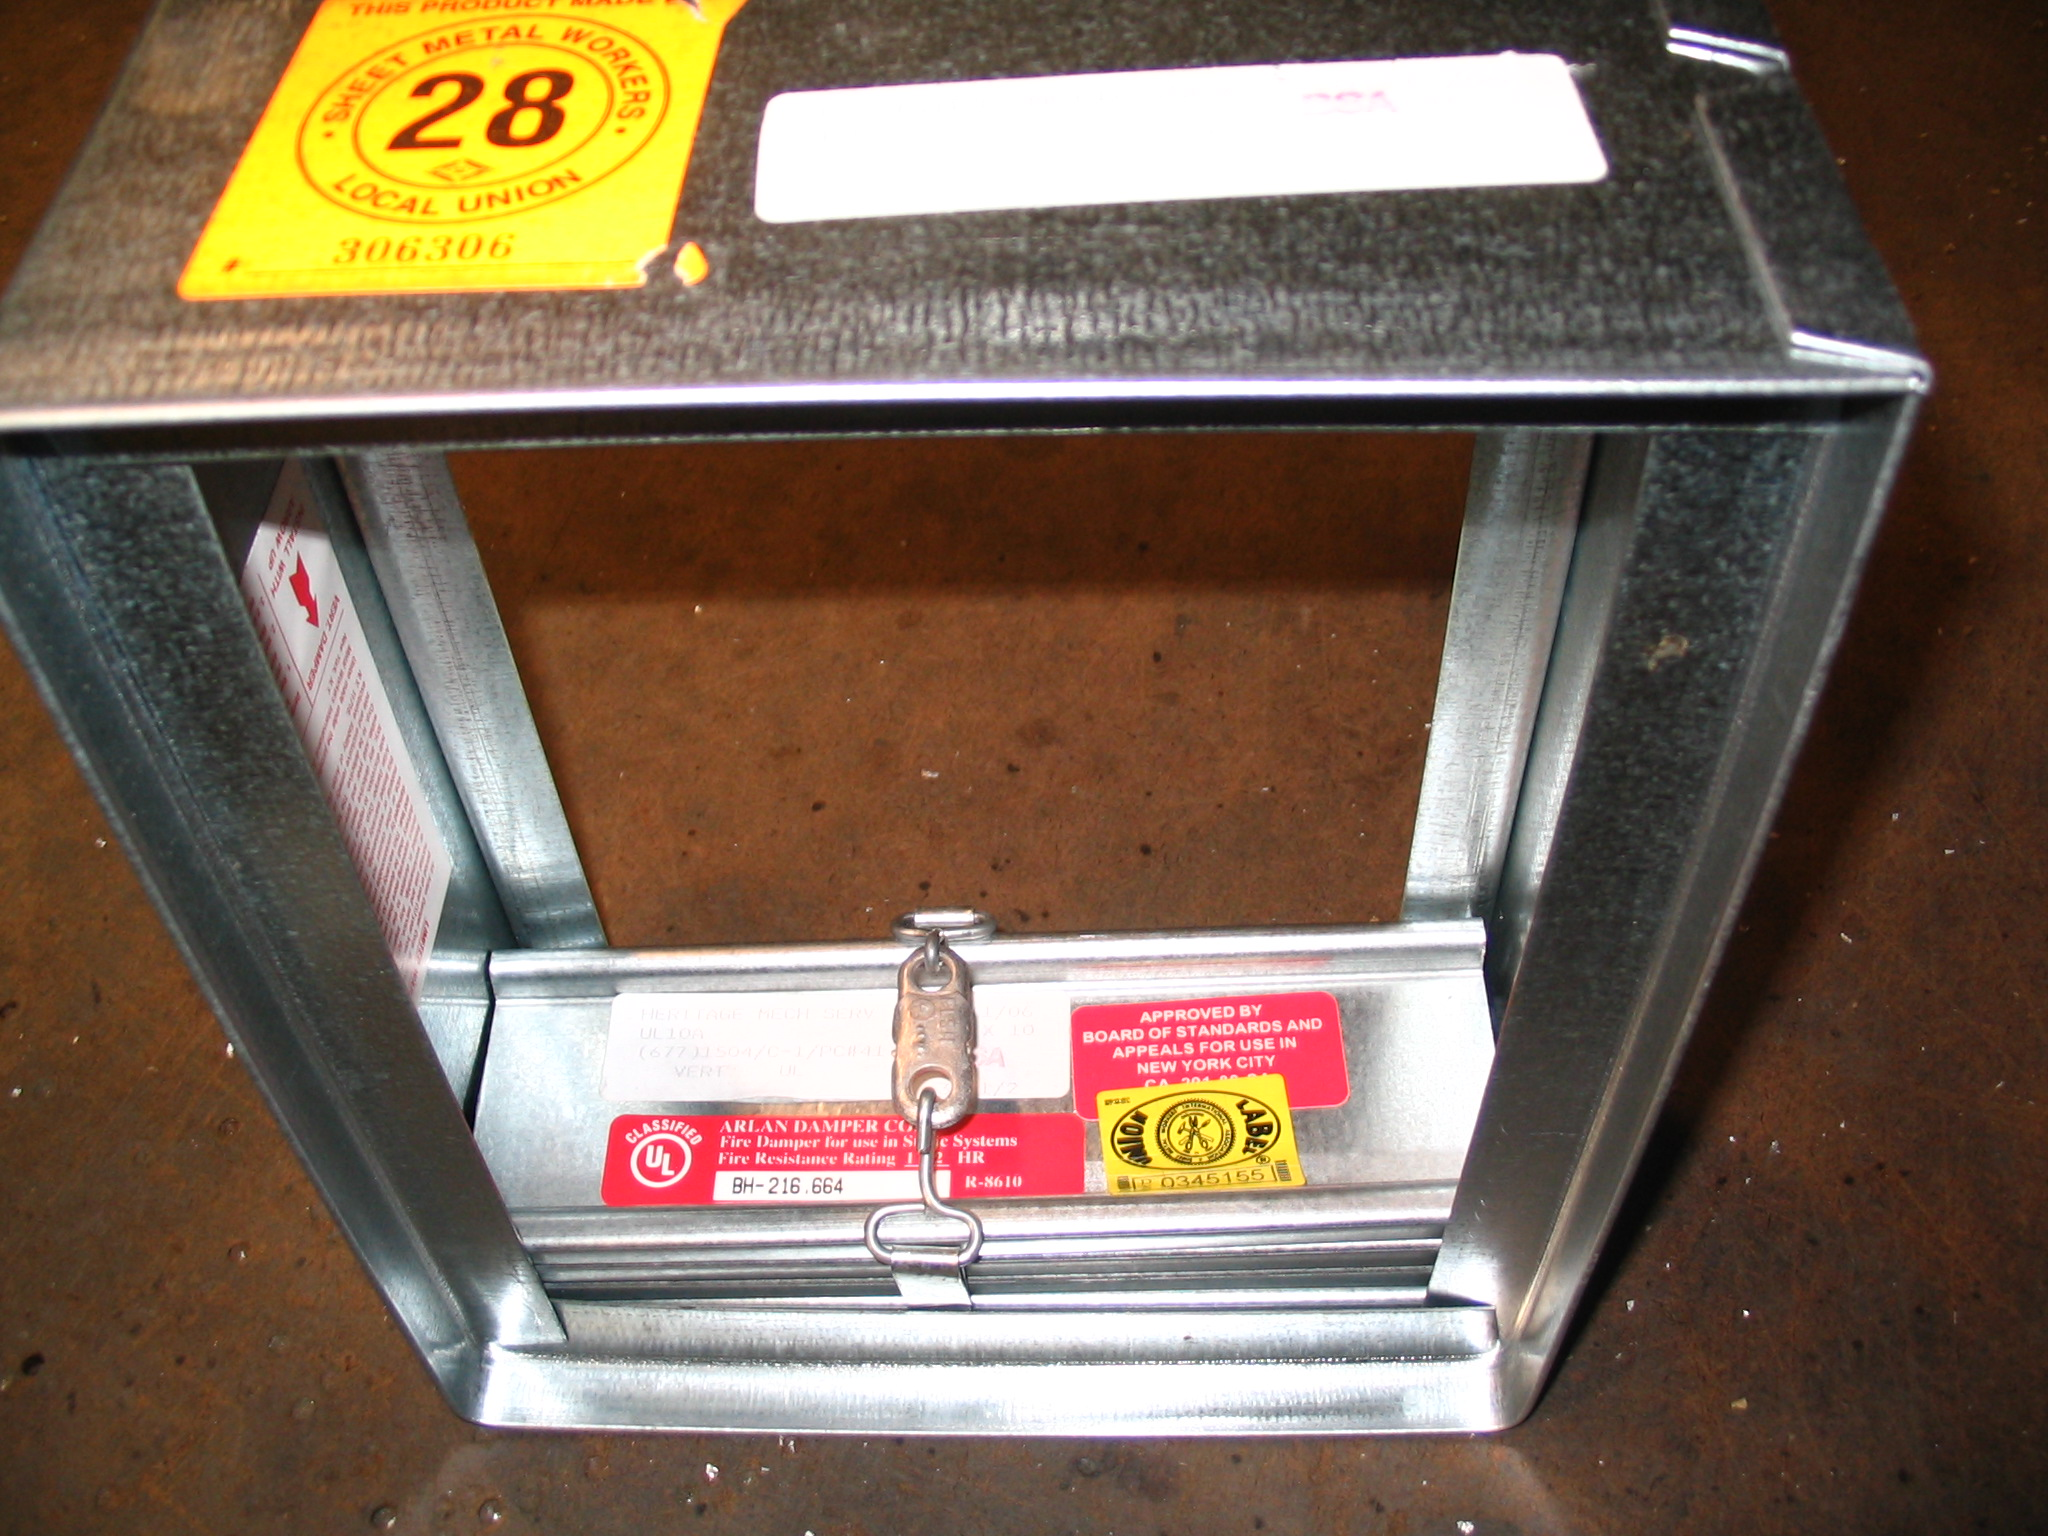 Model ul10al 3 hour rated fire damper for 1 hour fire door specification